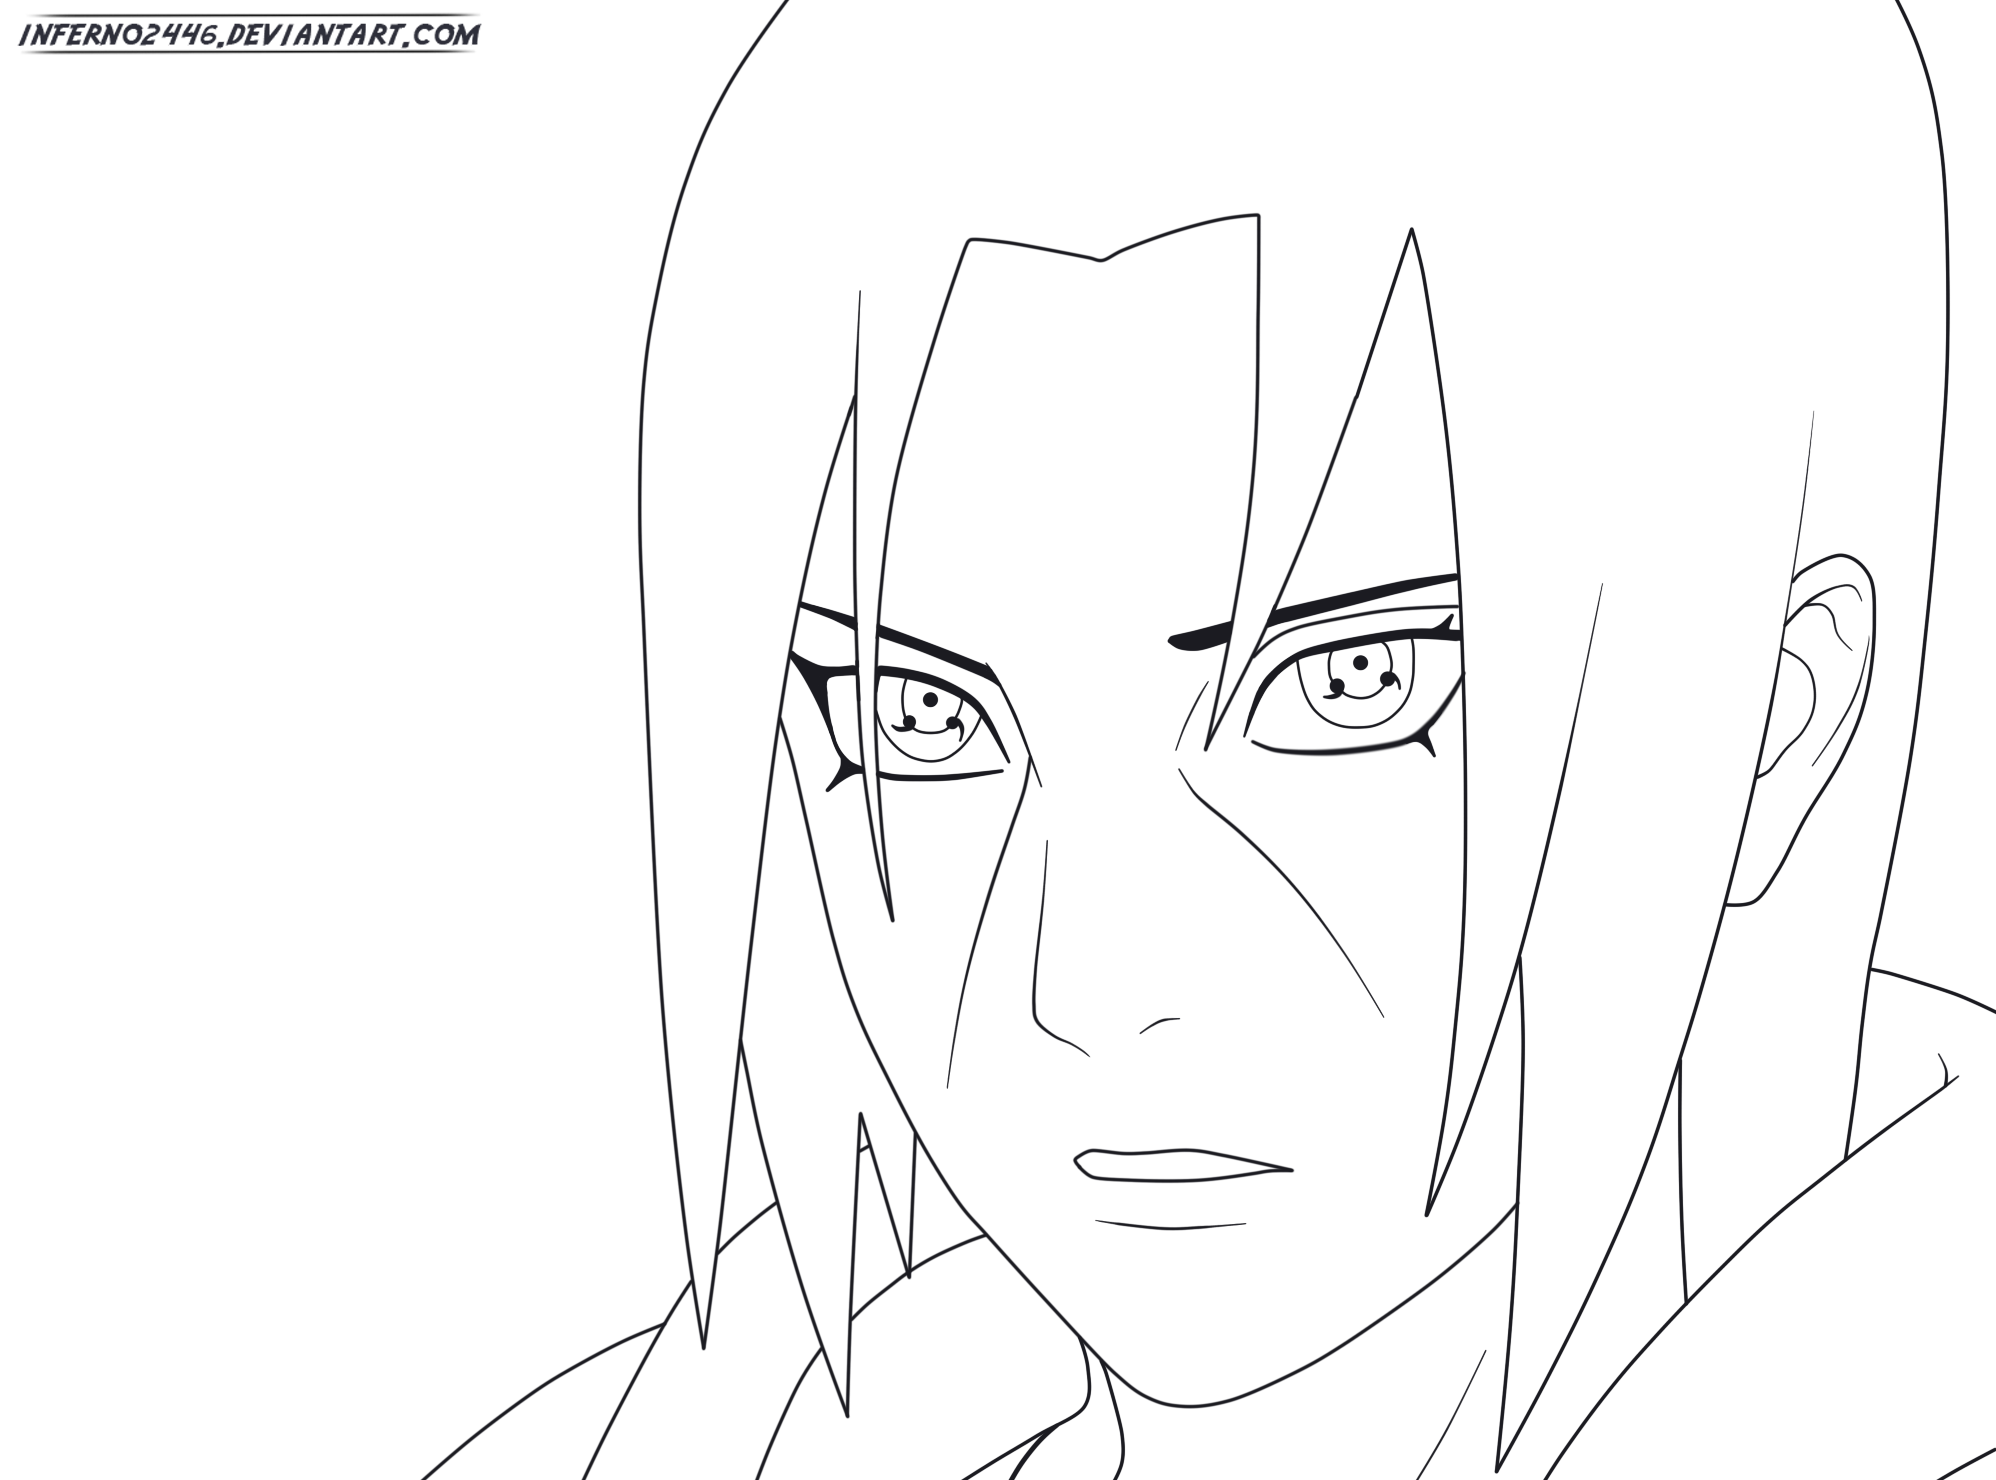 Desenhos Para Colorir Do Sasuke Uchiha further Naruto Rasengan Para Colorear CbKaG6Kbz also Desenhos Para Colorir Pintar Do Naruto additionally Goku Para Colorear further Orochimaru S Student Sasuke 316932925. on sasuke rinnegan coloring pages